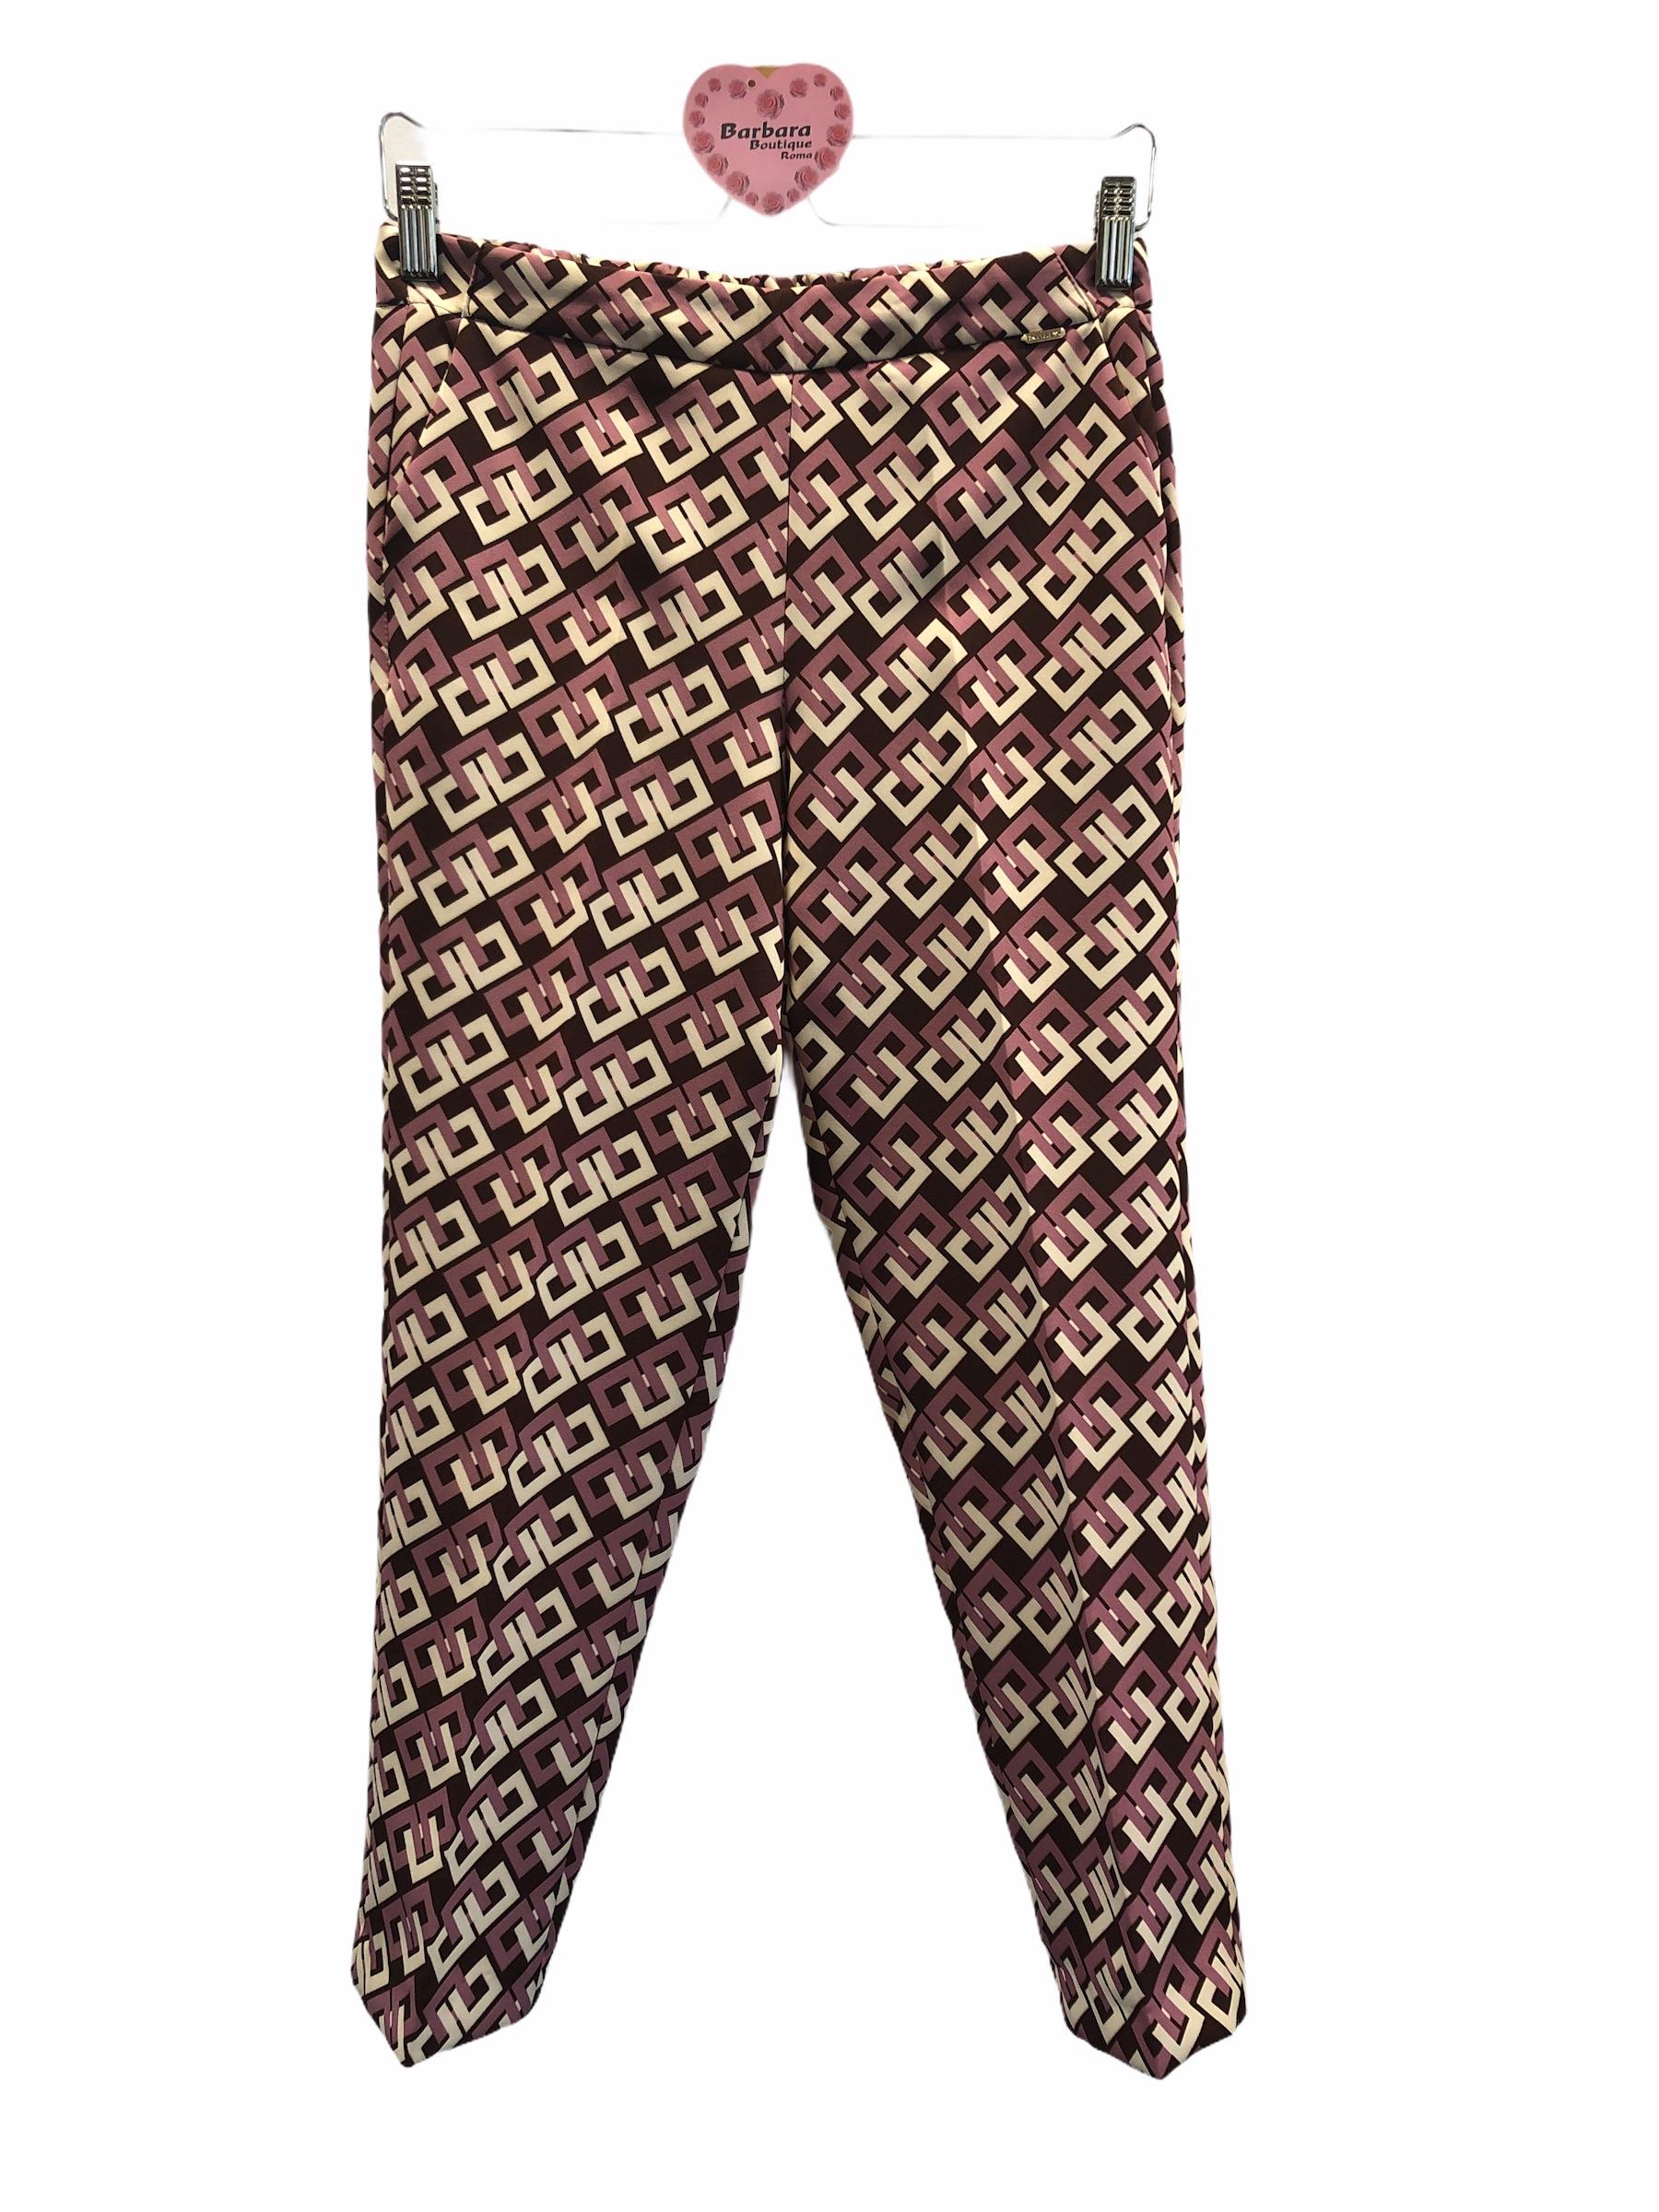 Pantalone capri catene